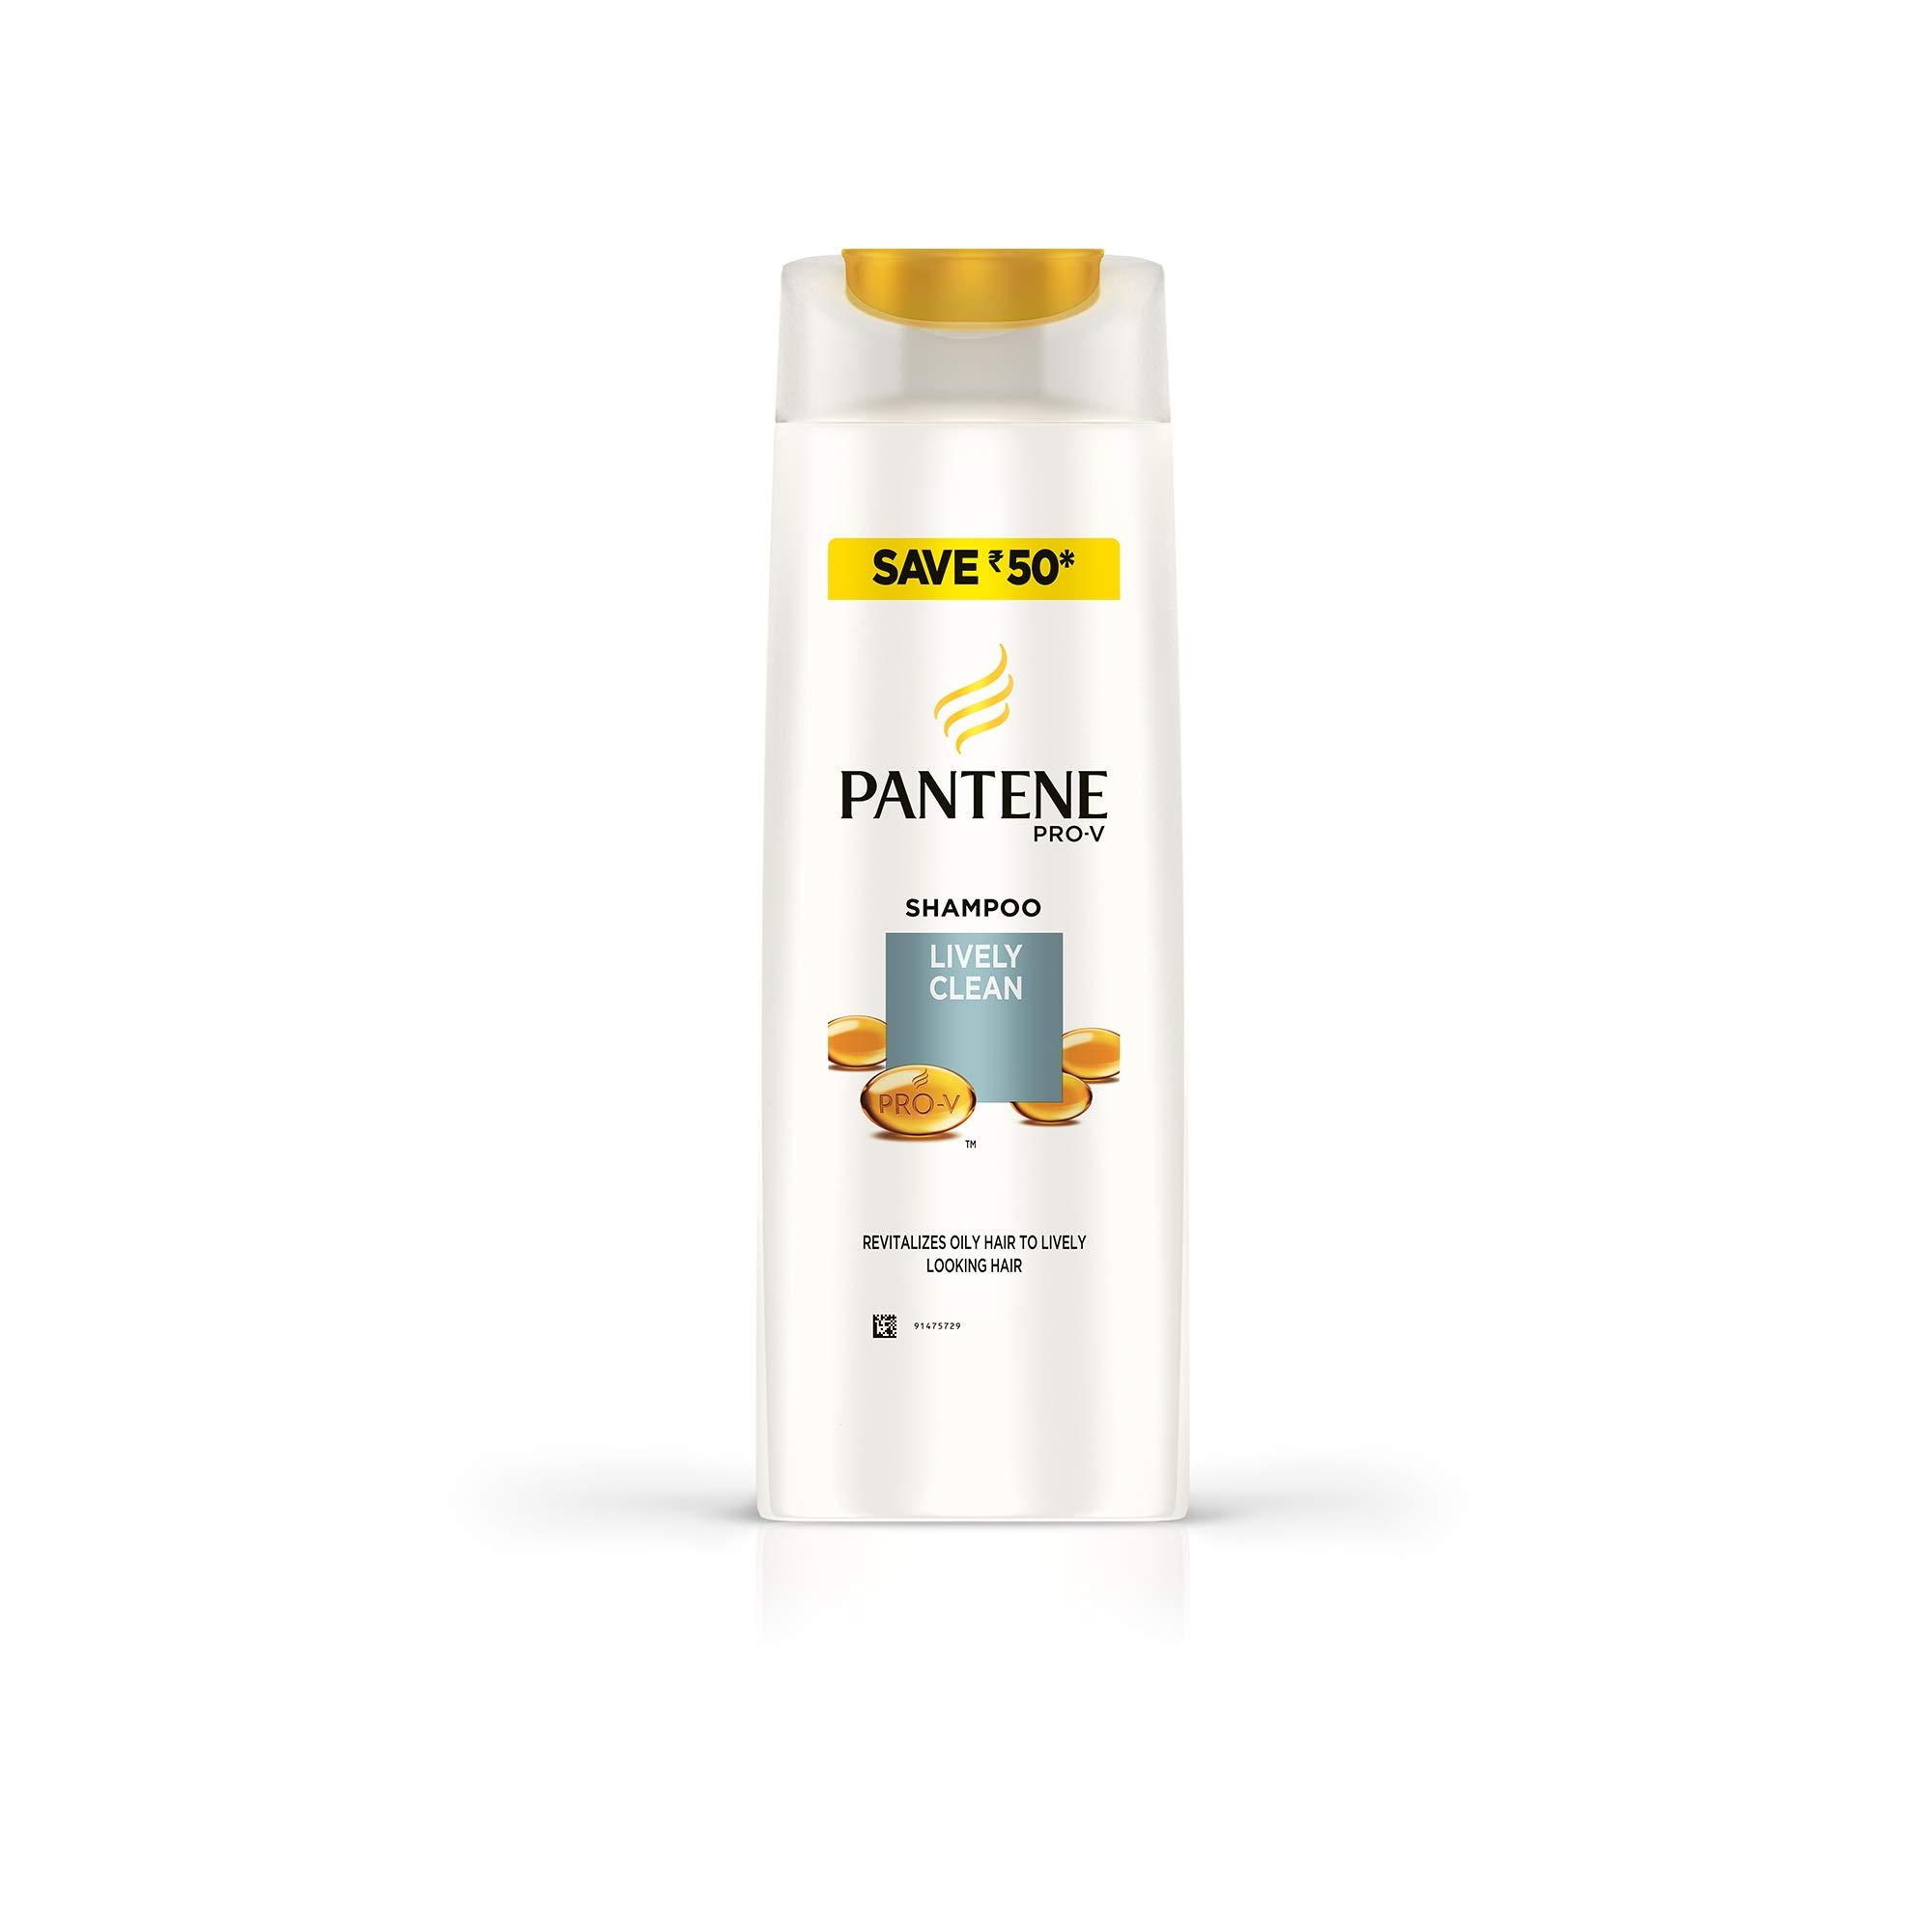 Pantene Lively Clean Shampoo, 400ml product image